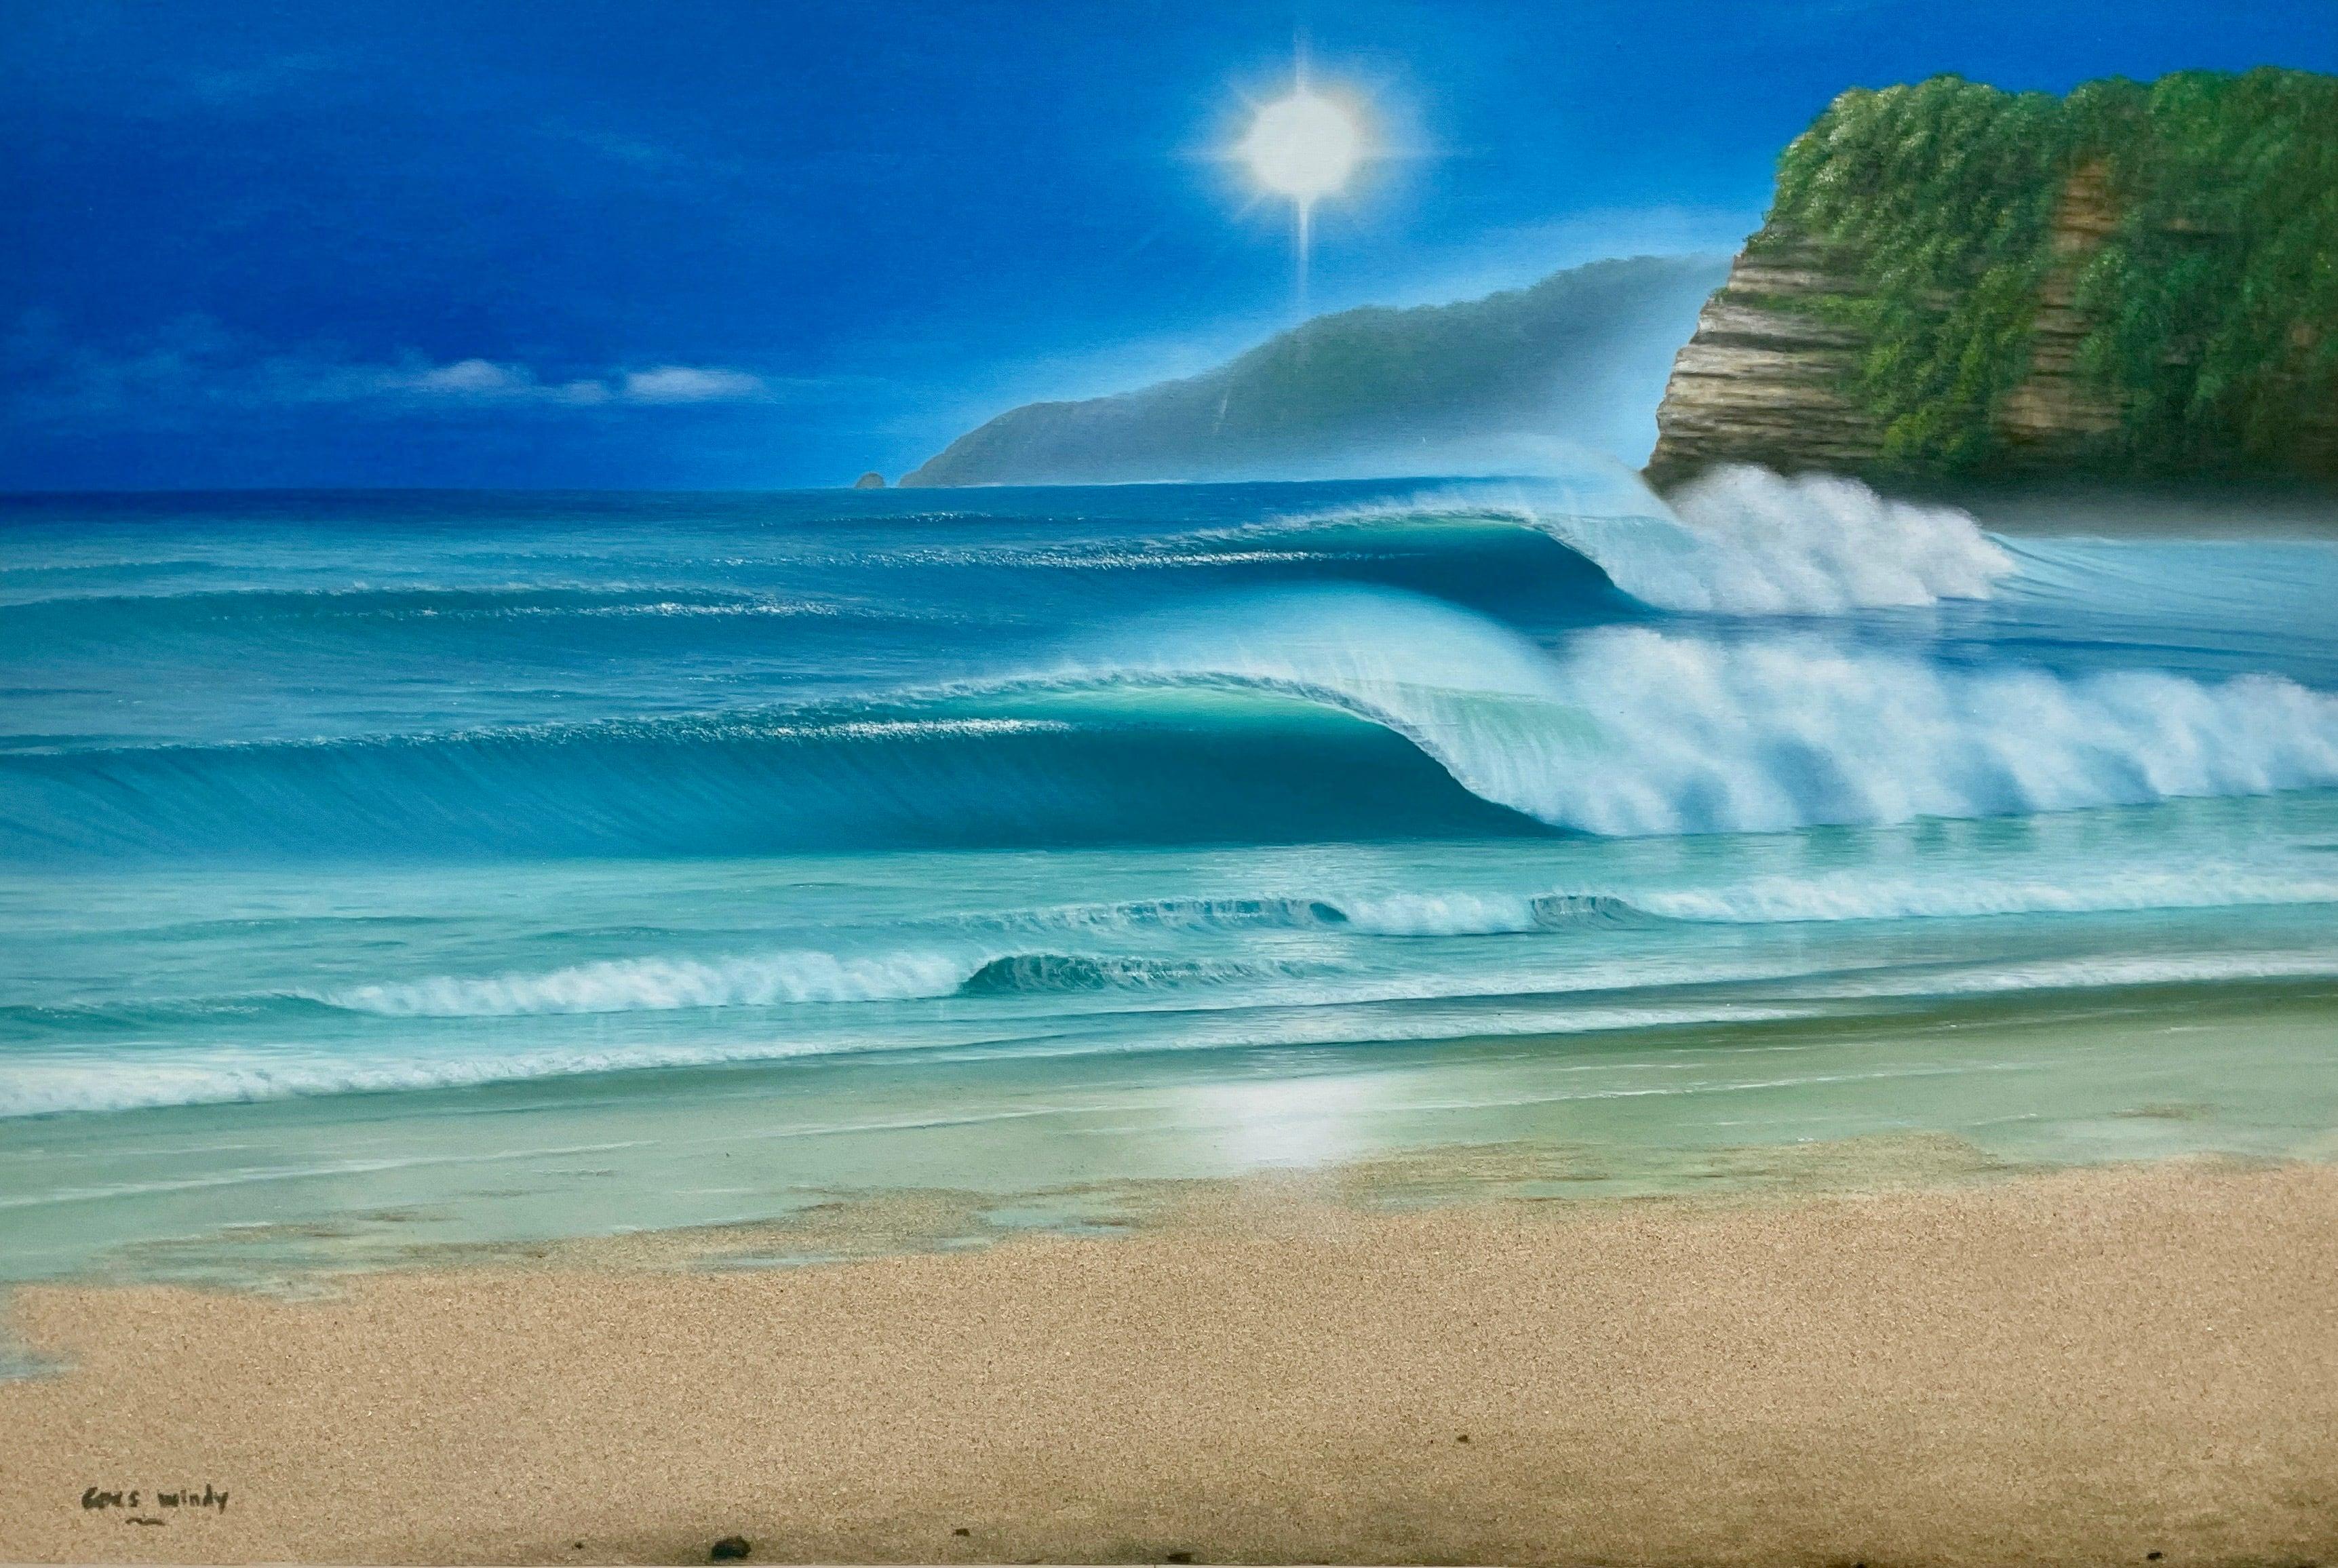 Dreamland Wave Art P80 特注サイズ with Real sand